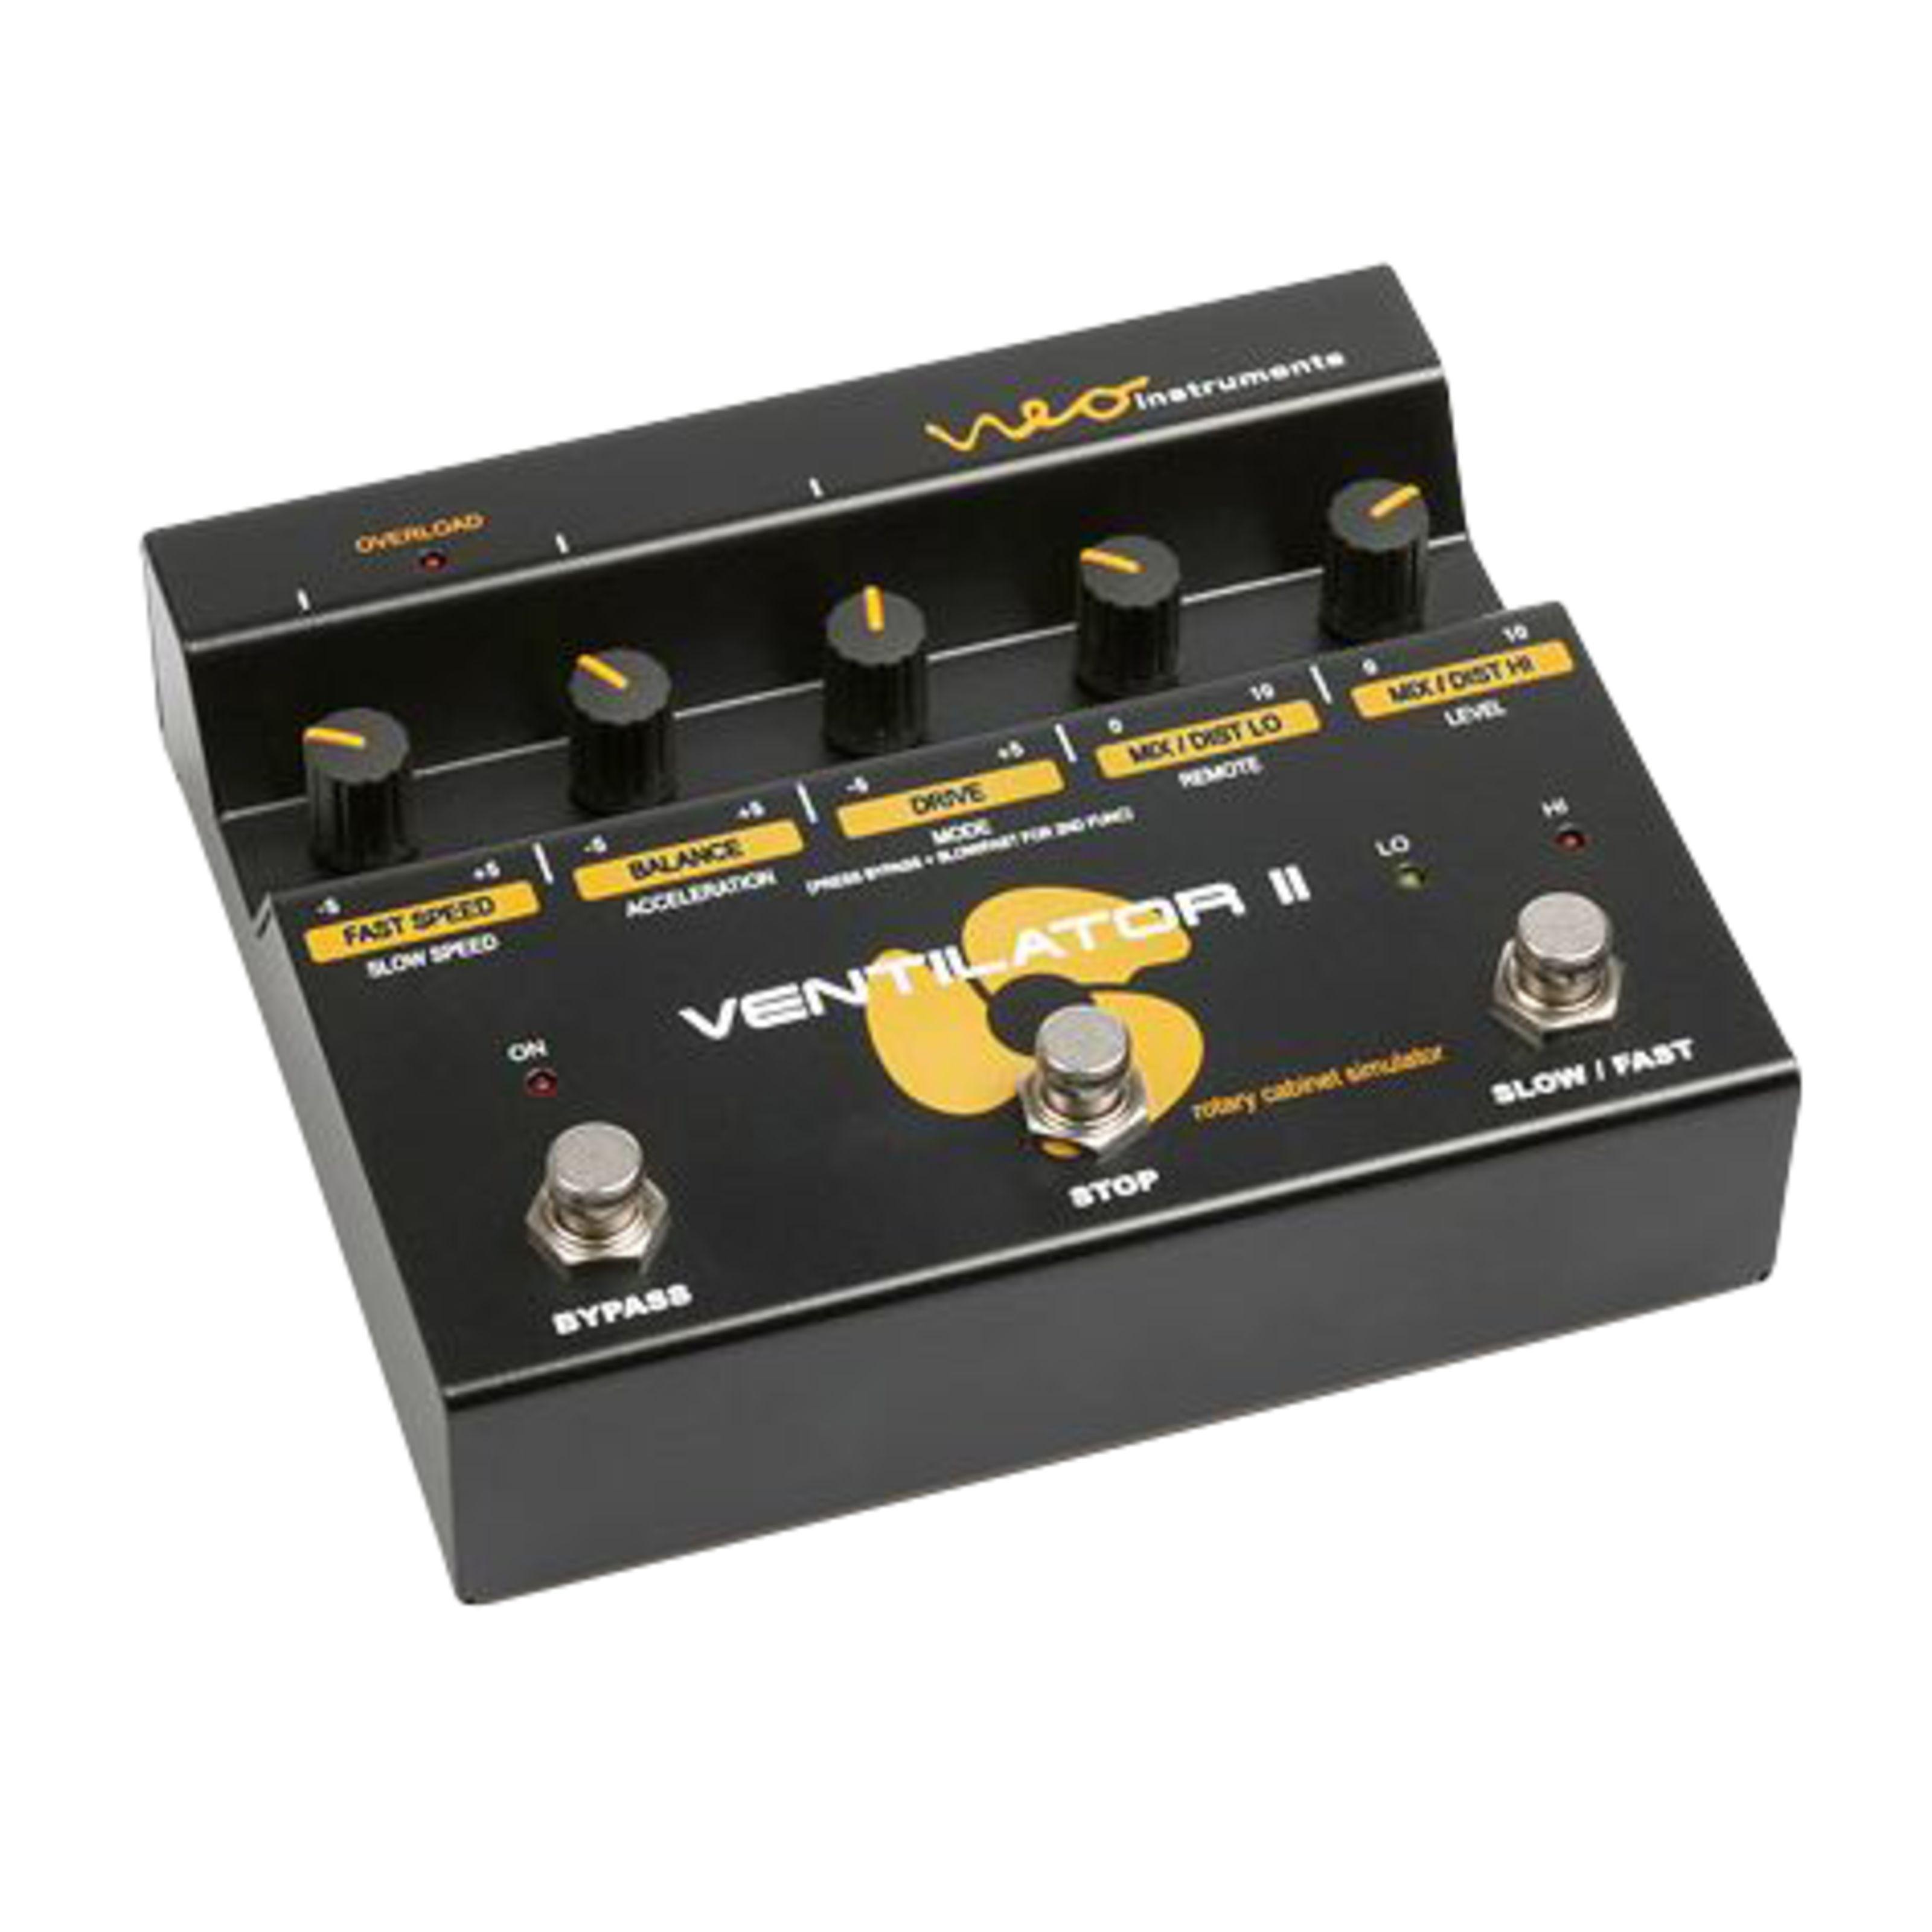 Neo Instruments - Ventilator II VentilatorII